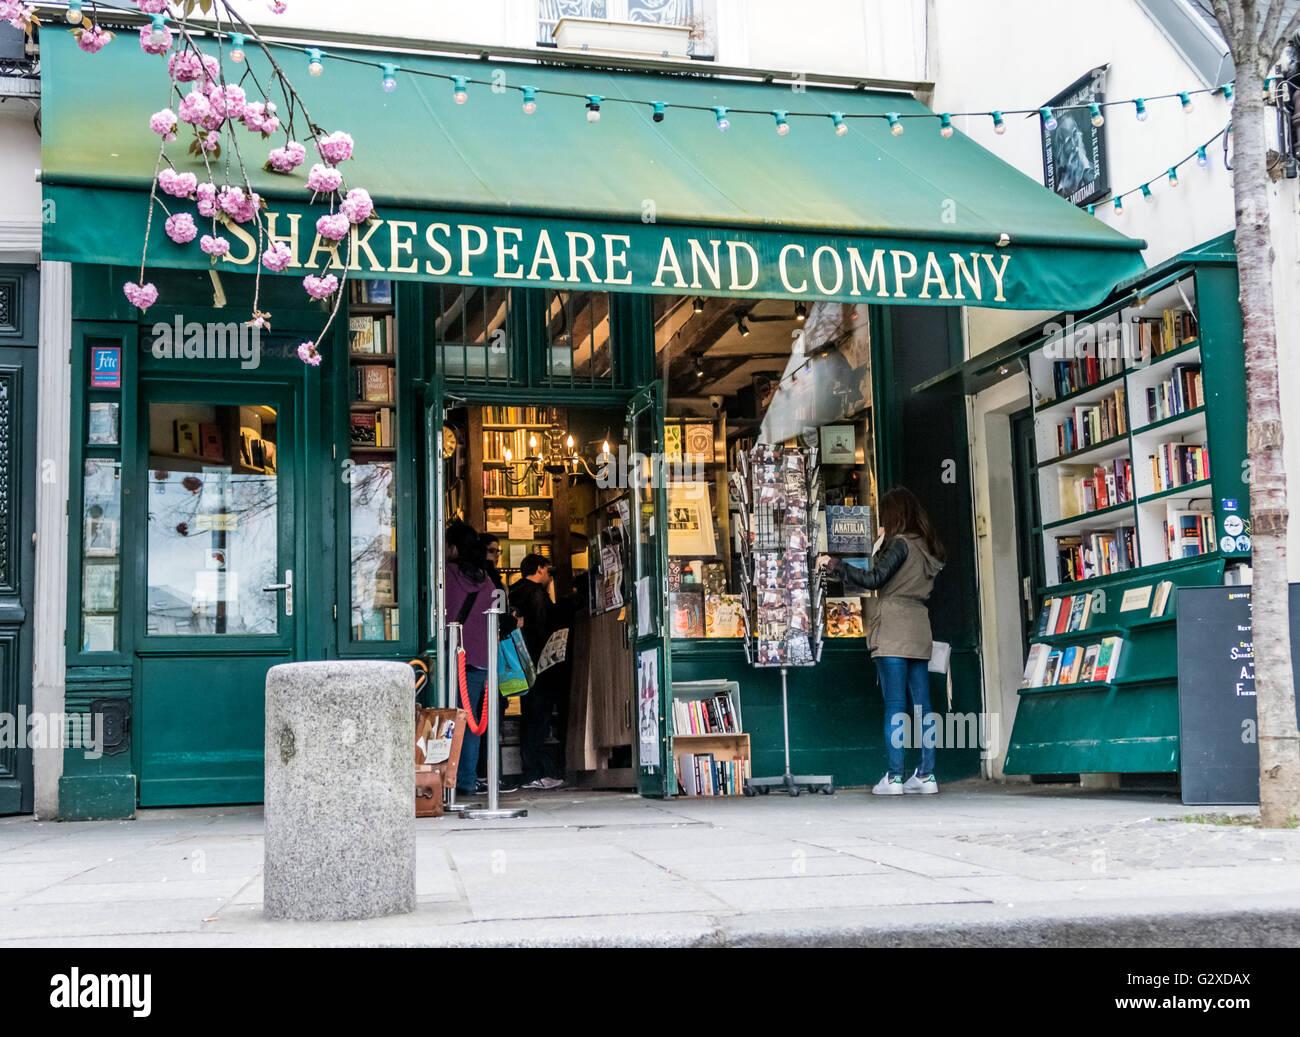 Shakespeare and Company bookstore, Paris - Stock Image